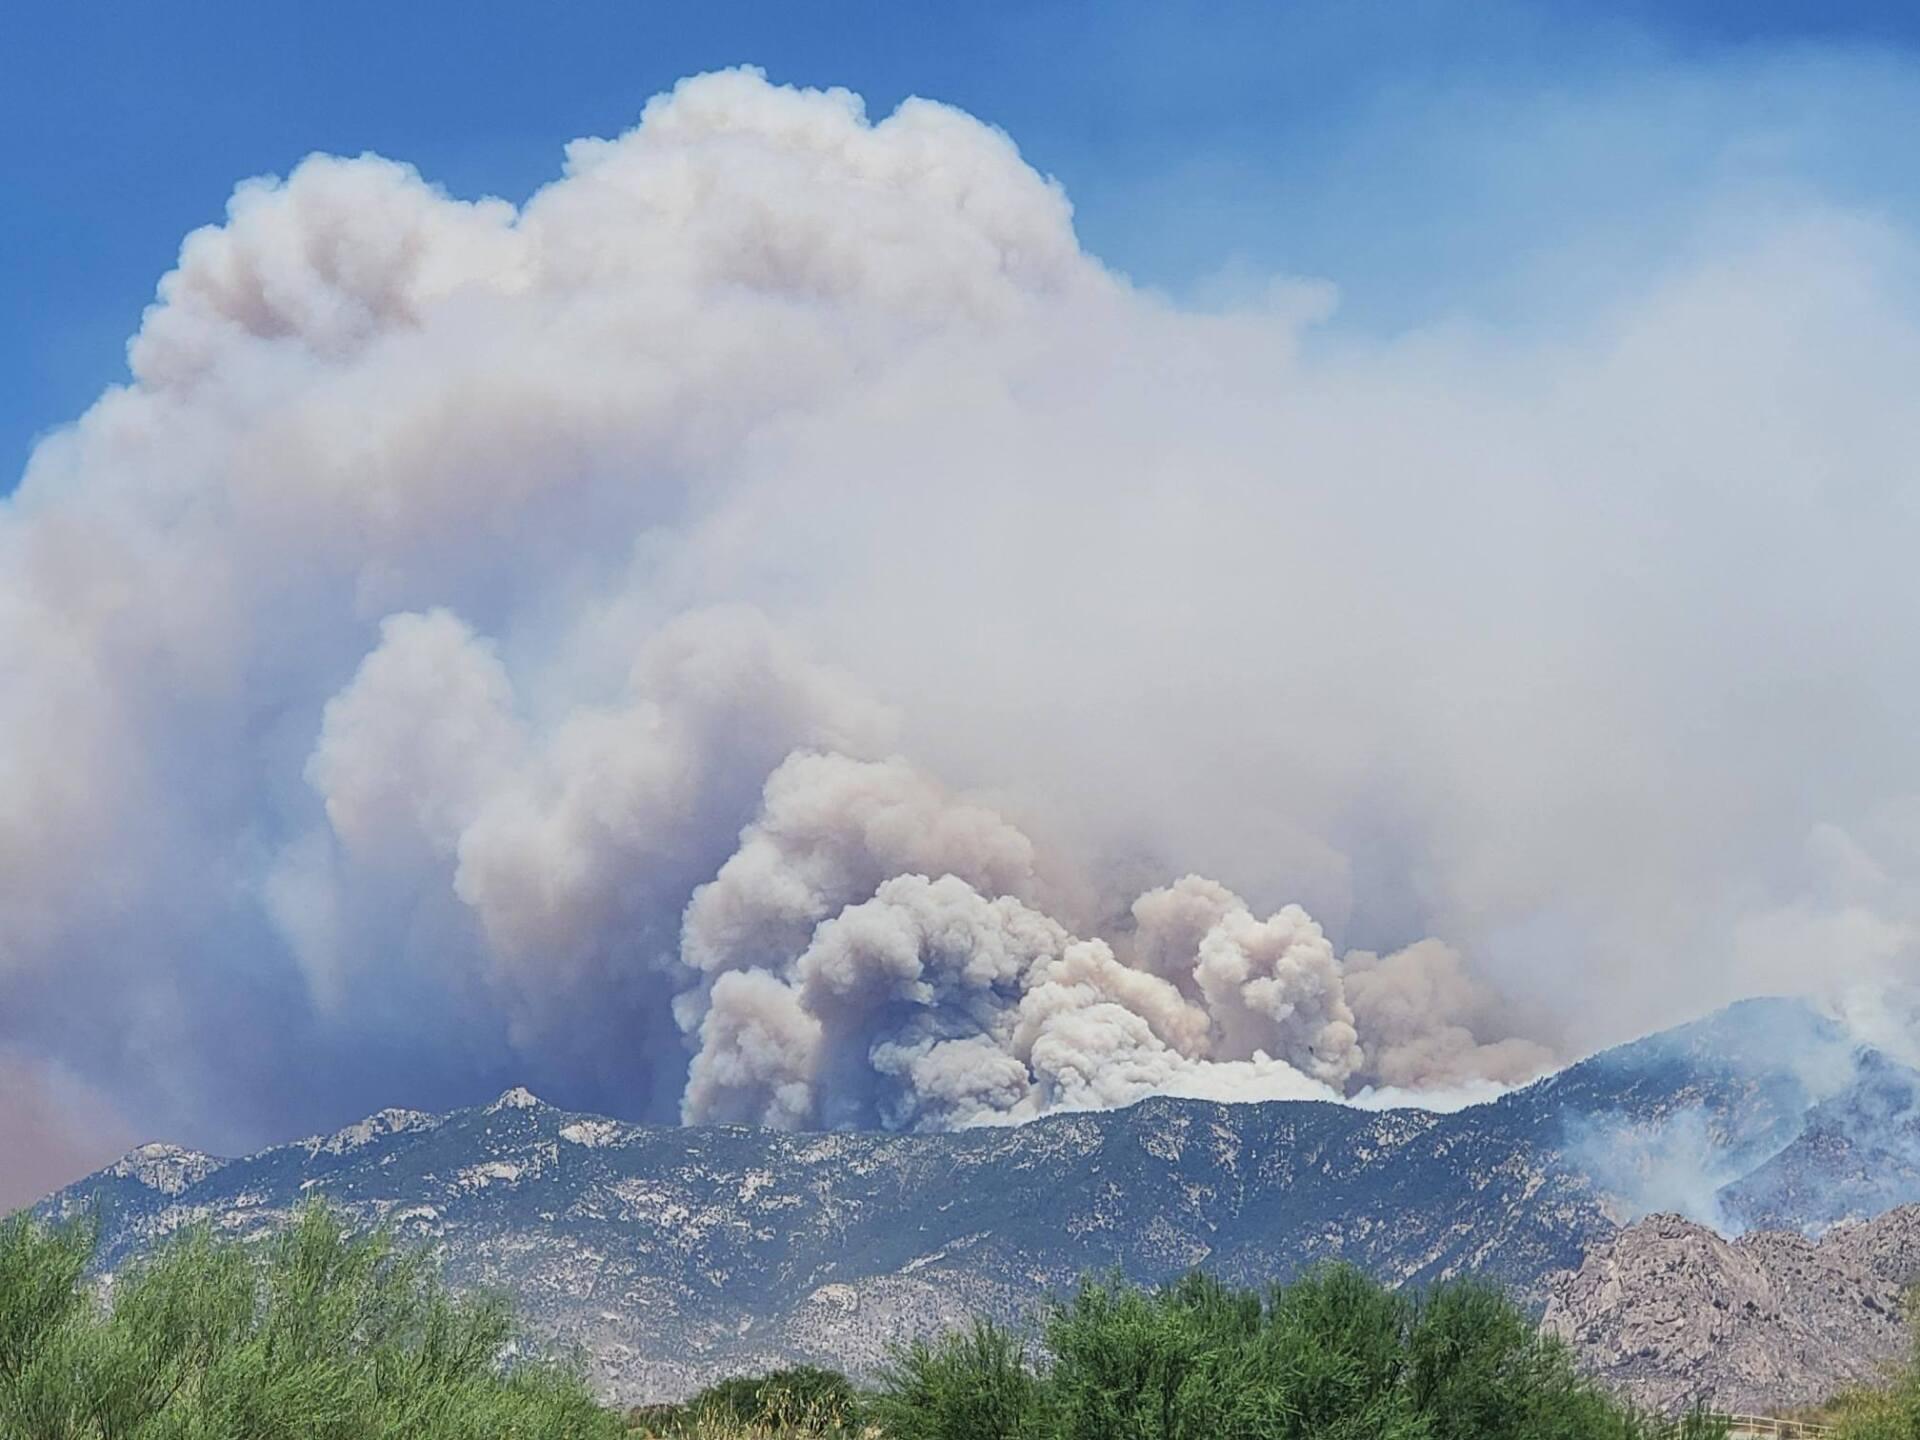 The Bighorn Fire burns heavy fuel along the La Canada Del Oro Ridge on Wednesday, June 17, 2020.